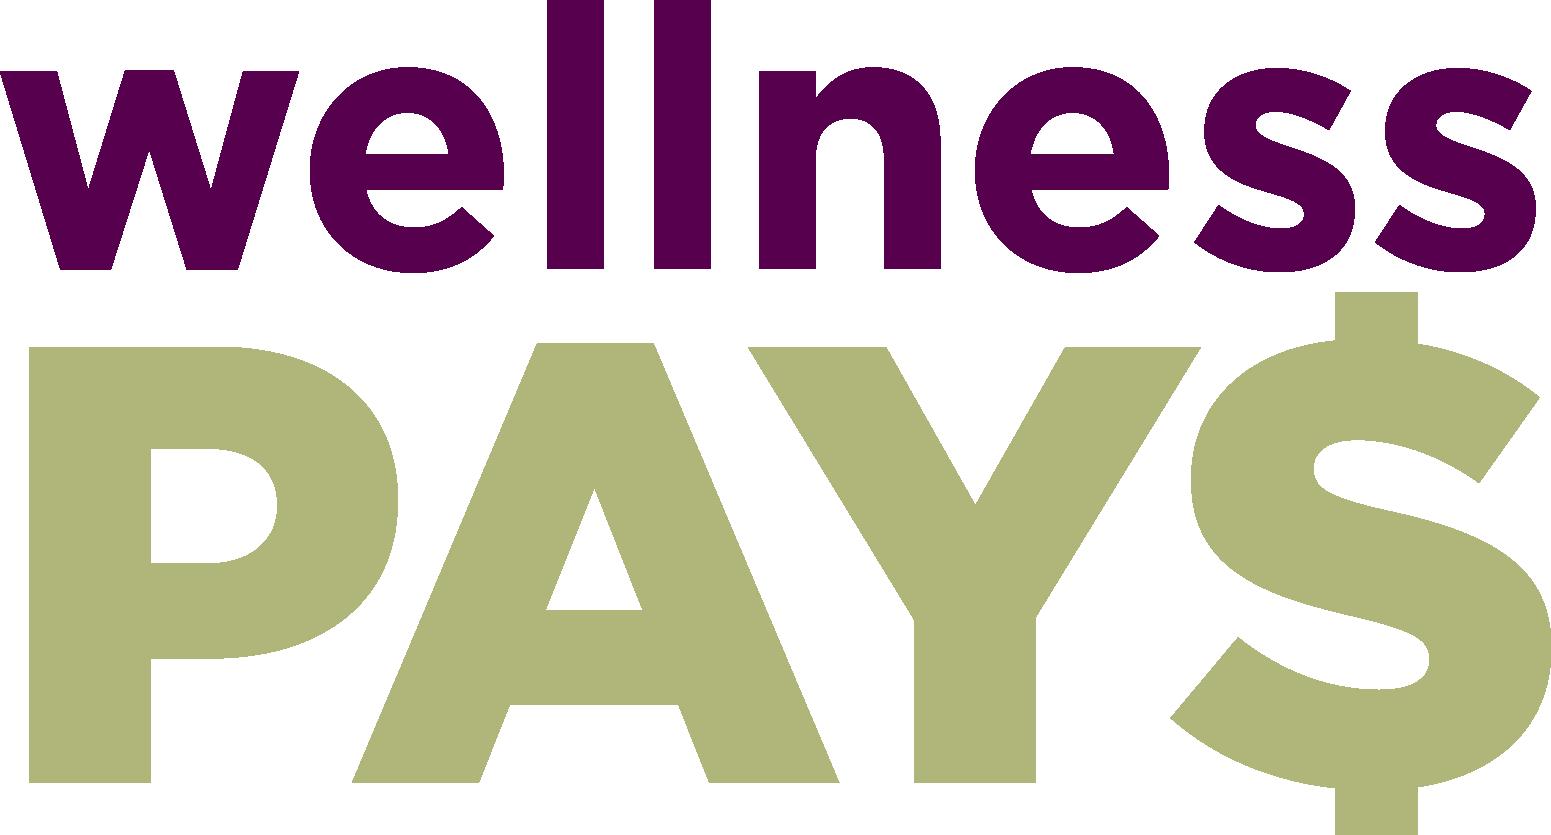 http://www.prlog.org/11212425-new-method-wellness-addiction-treatment ...